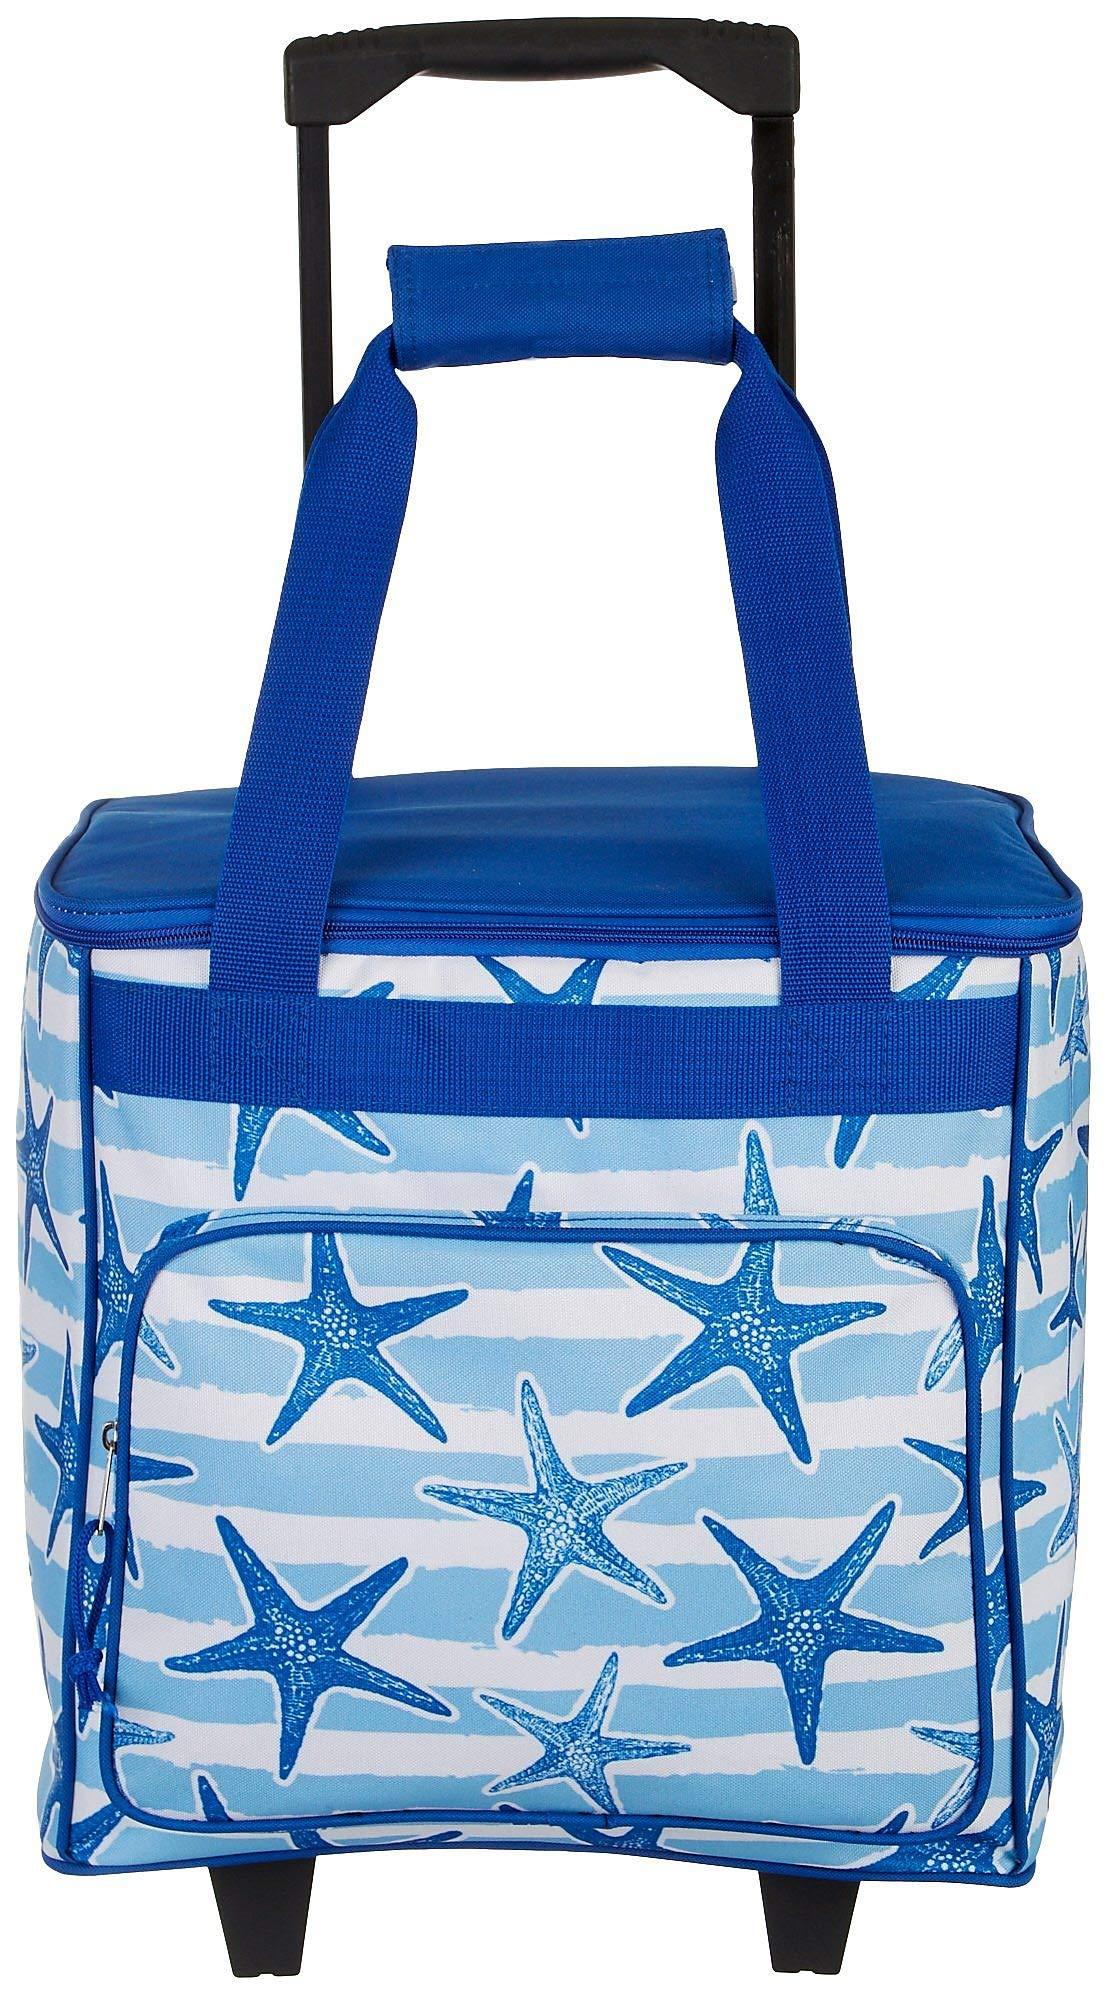 Tropix Starfish Stripes Rolling Cooler One Size Blue/White